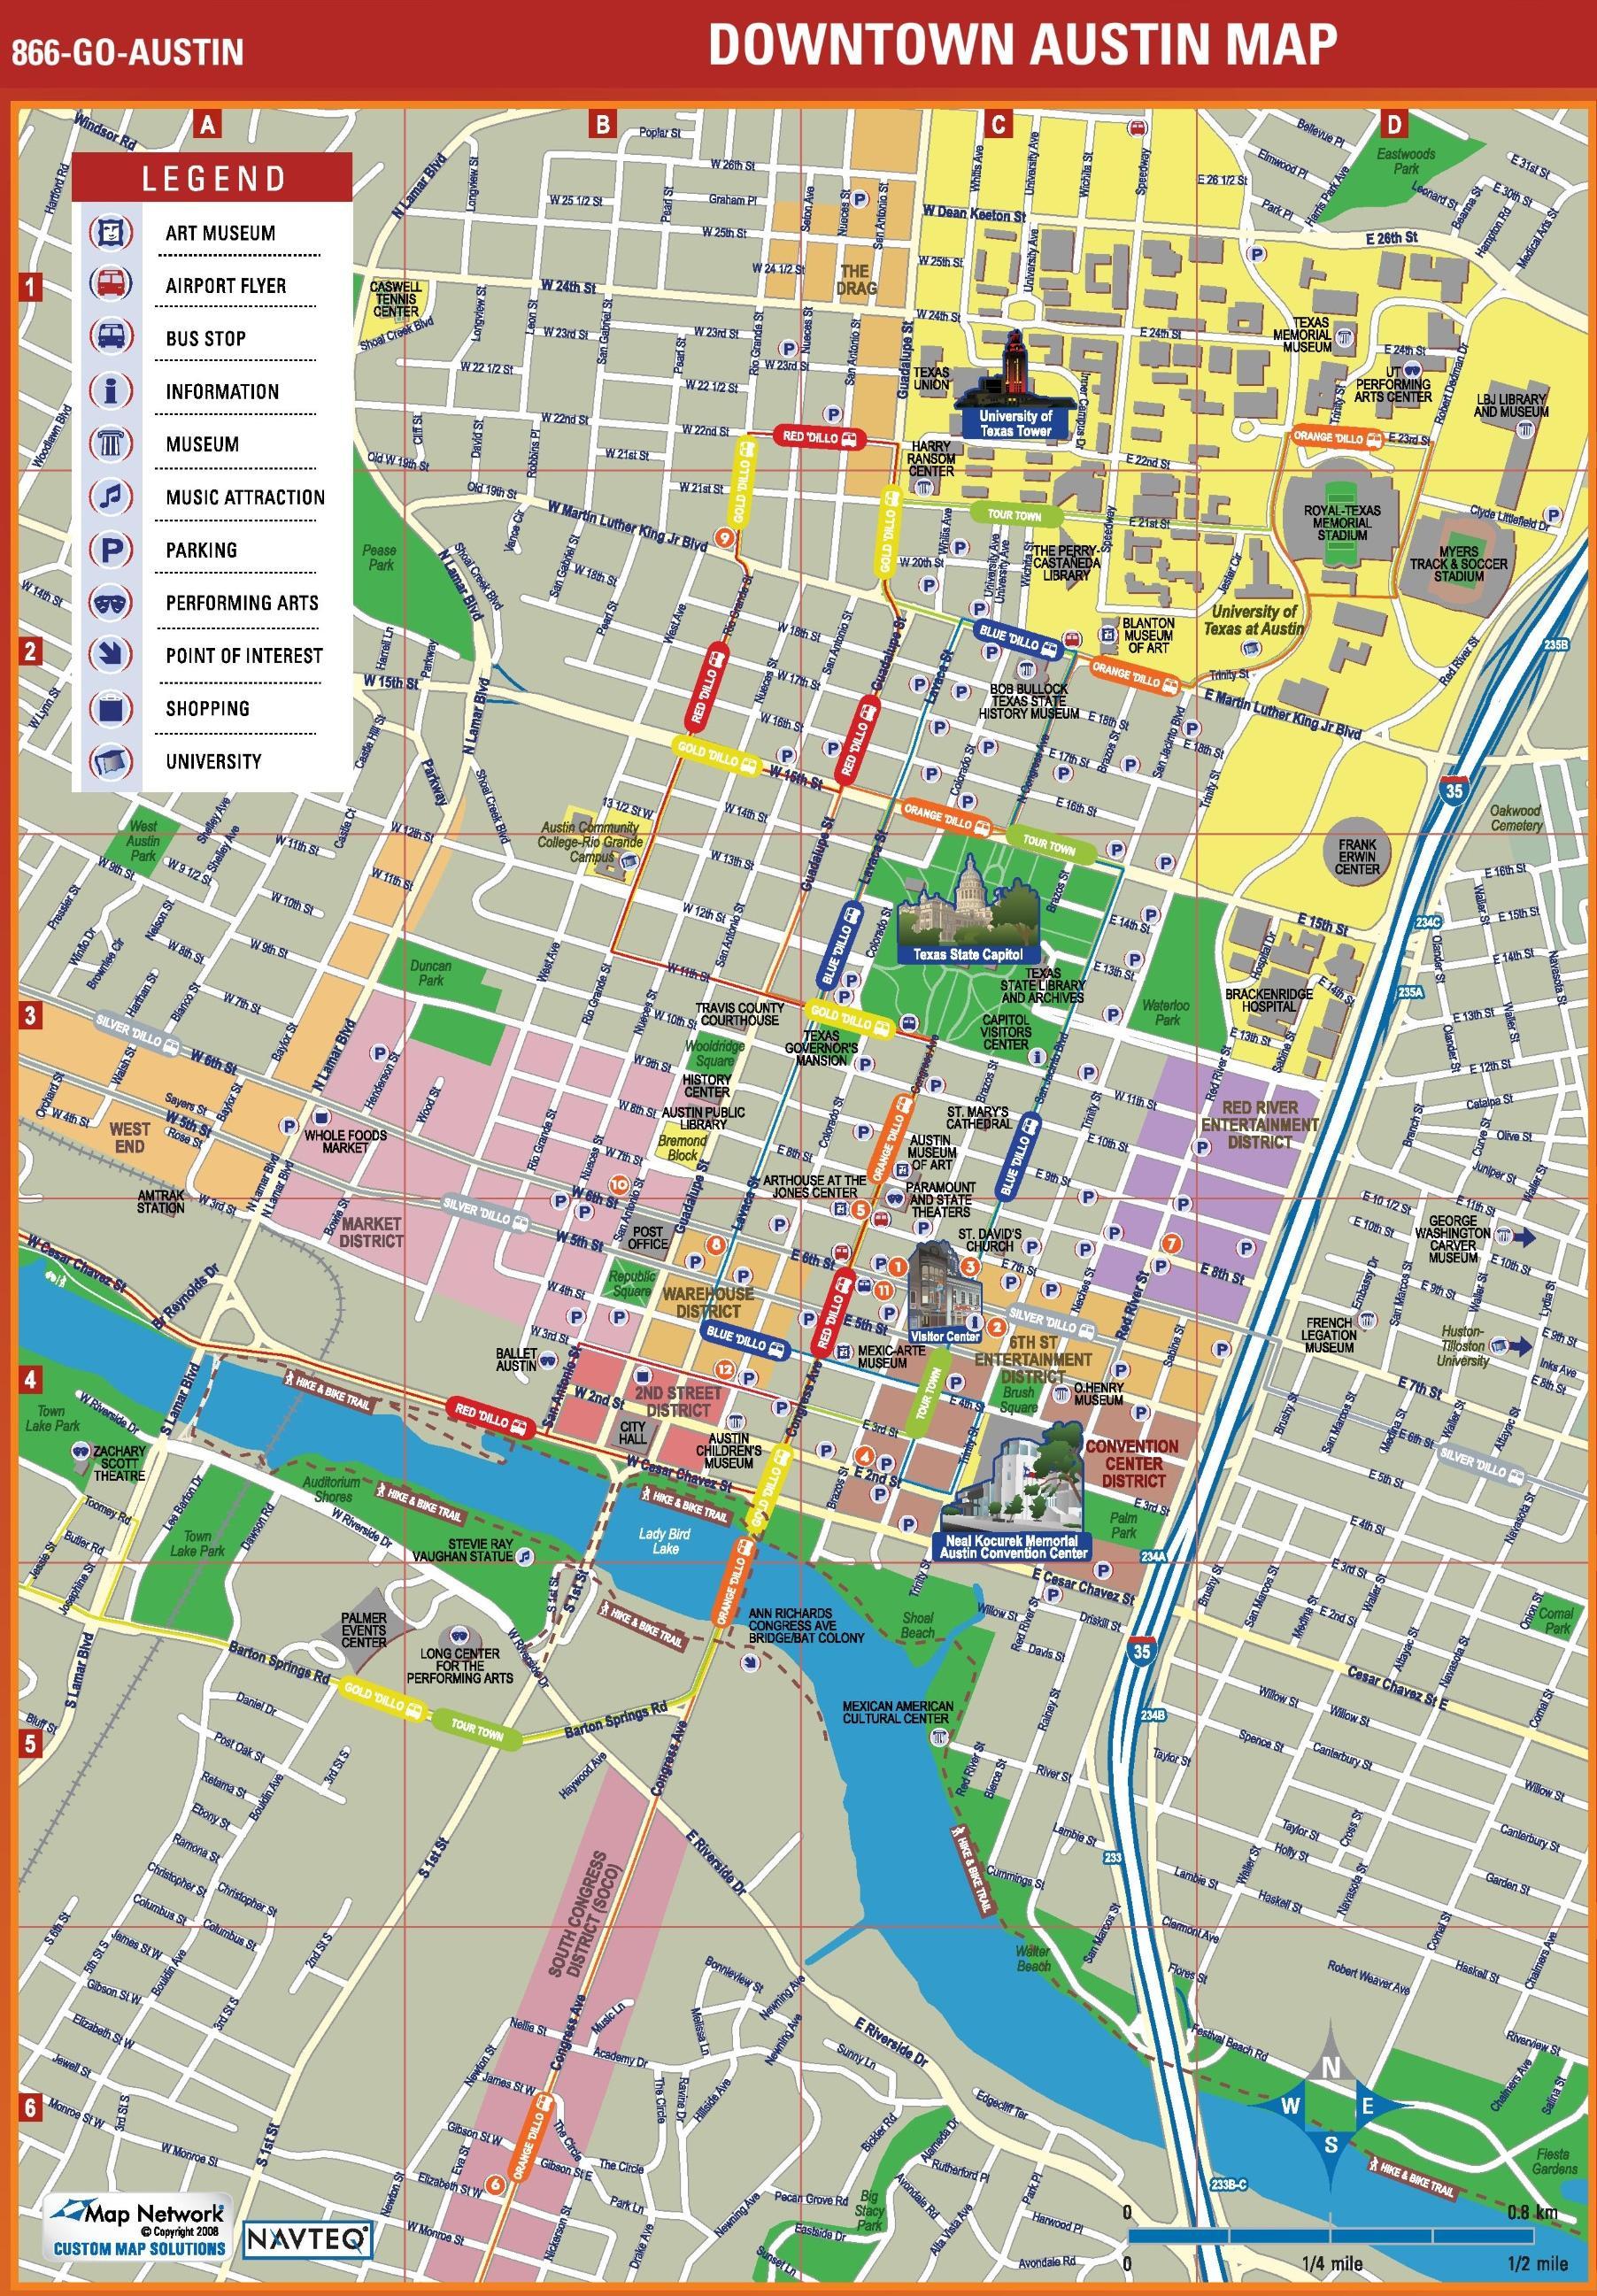 Austin City Map - City Of Austin Map (Texas - Usa) - Austin Texas City Map